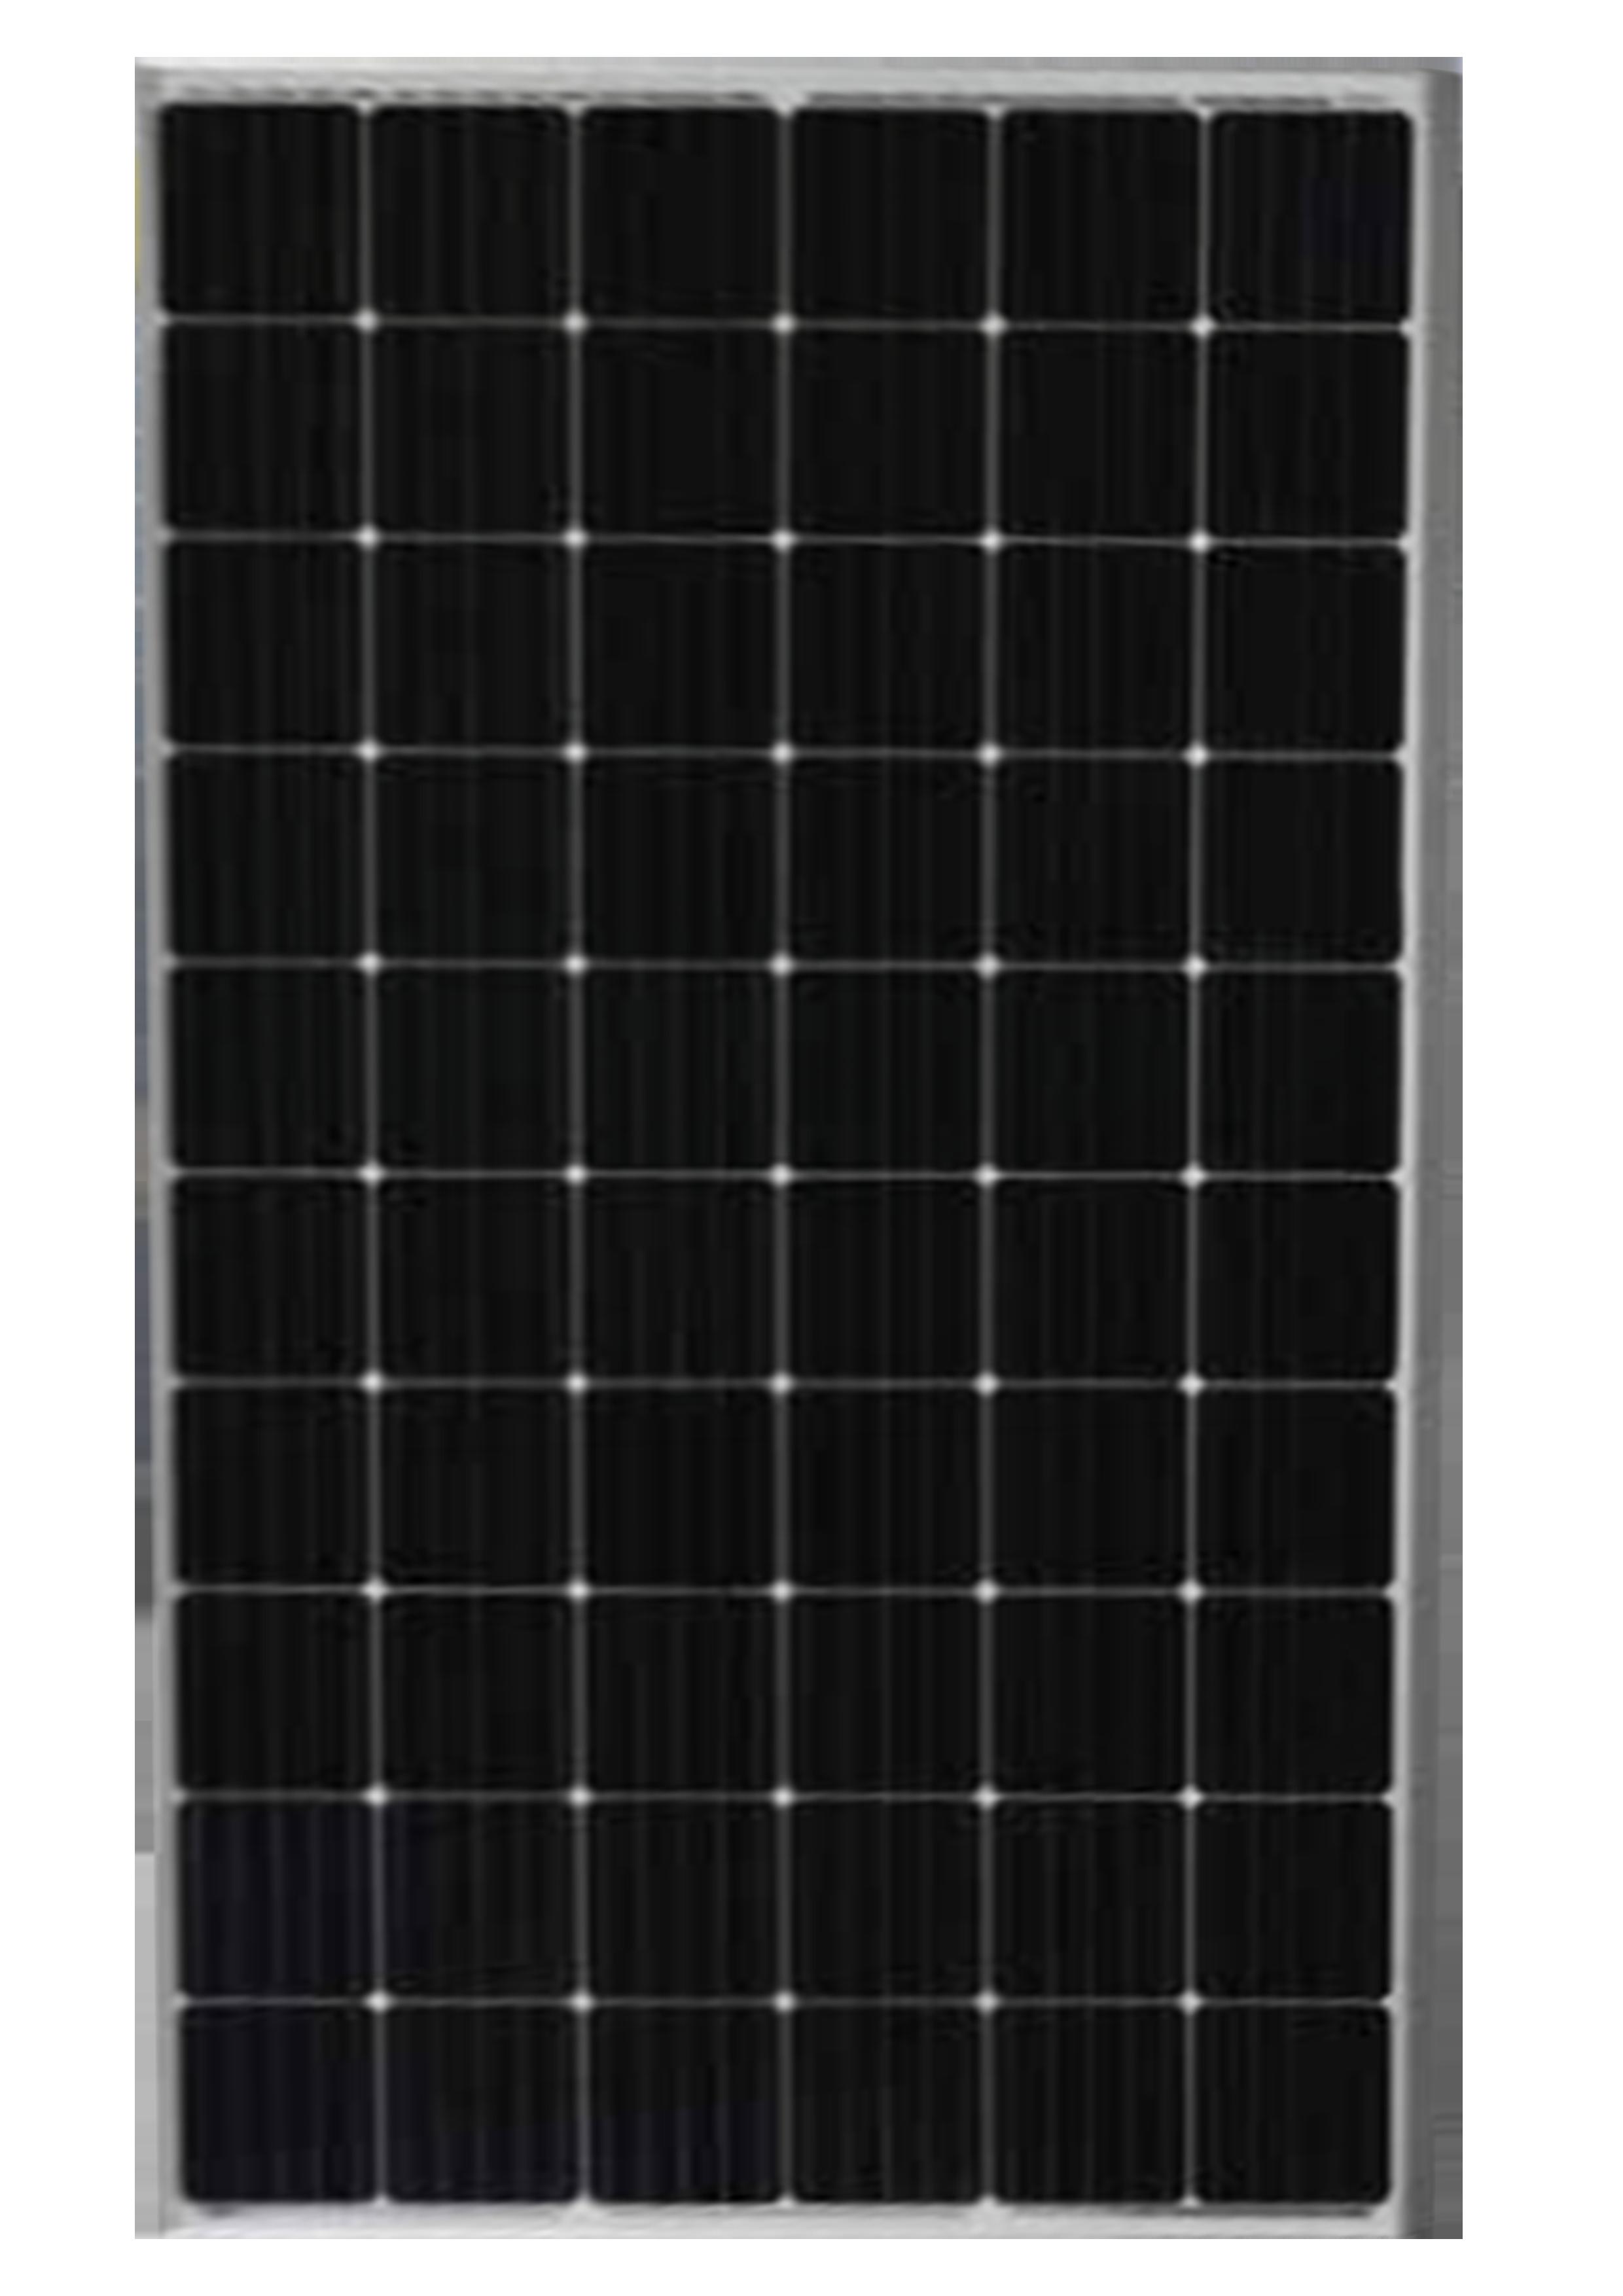 JA Solar Mono PERC 300-320W